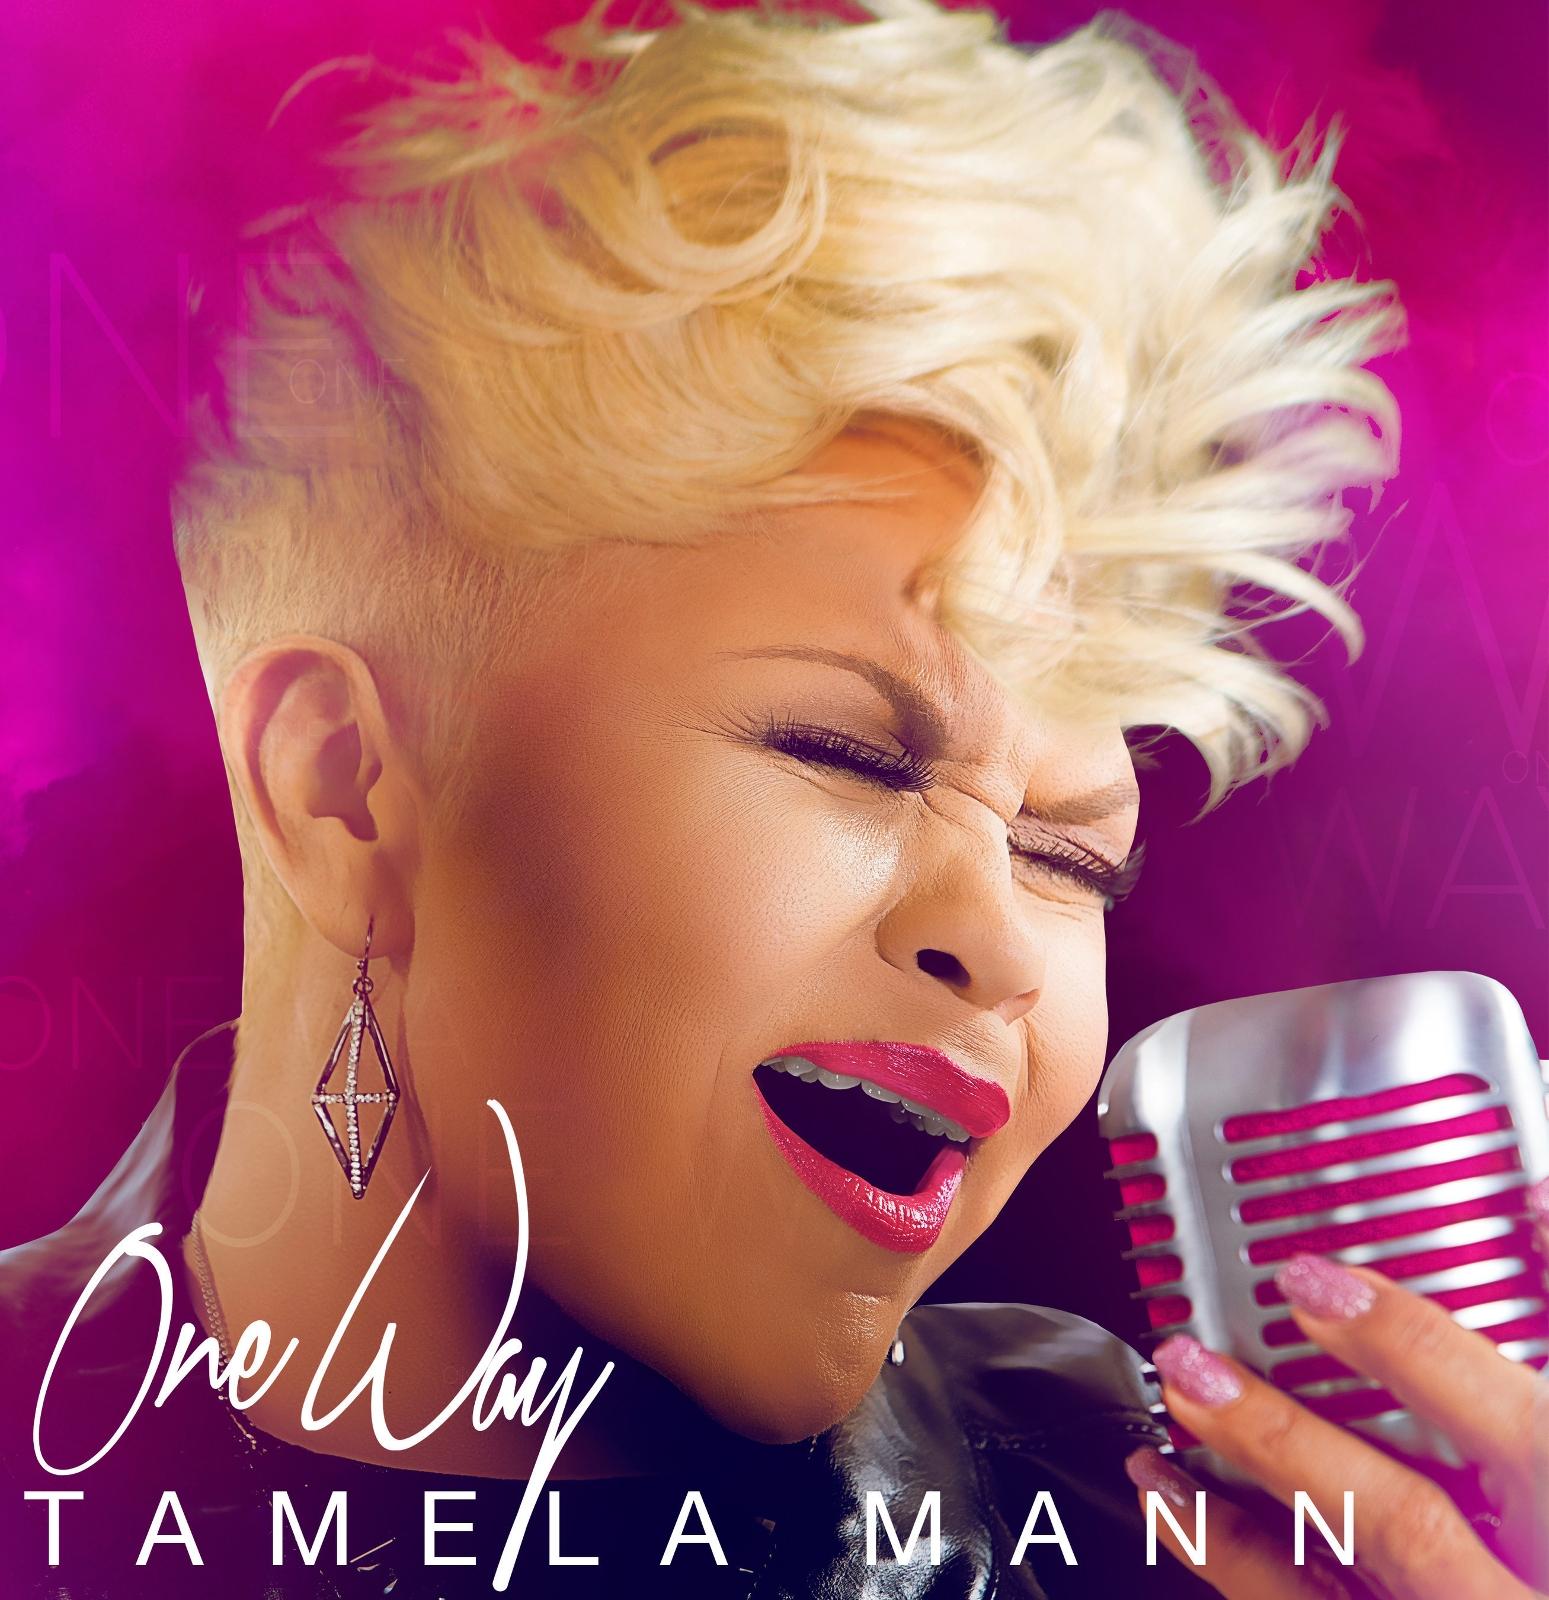 tamela-mann-one-way